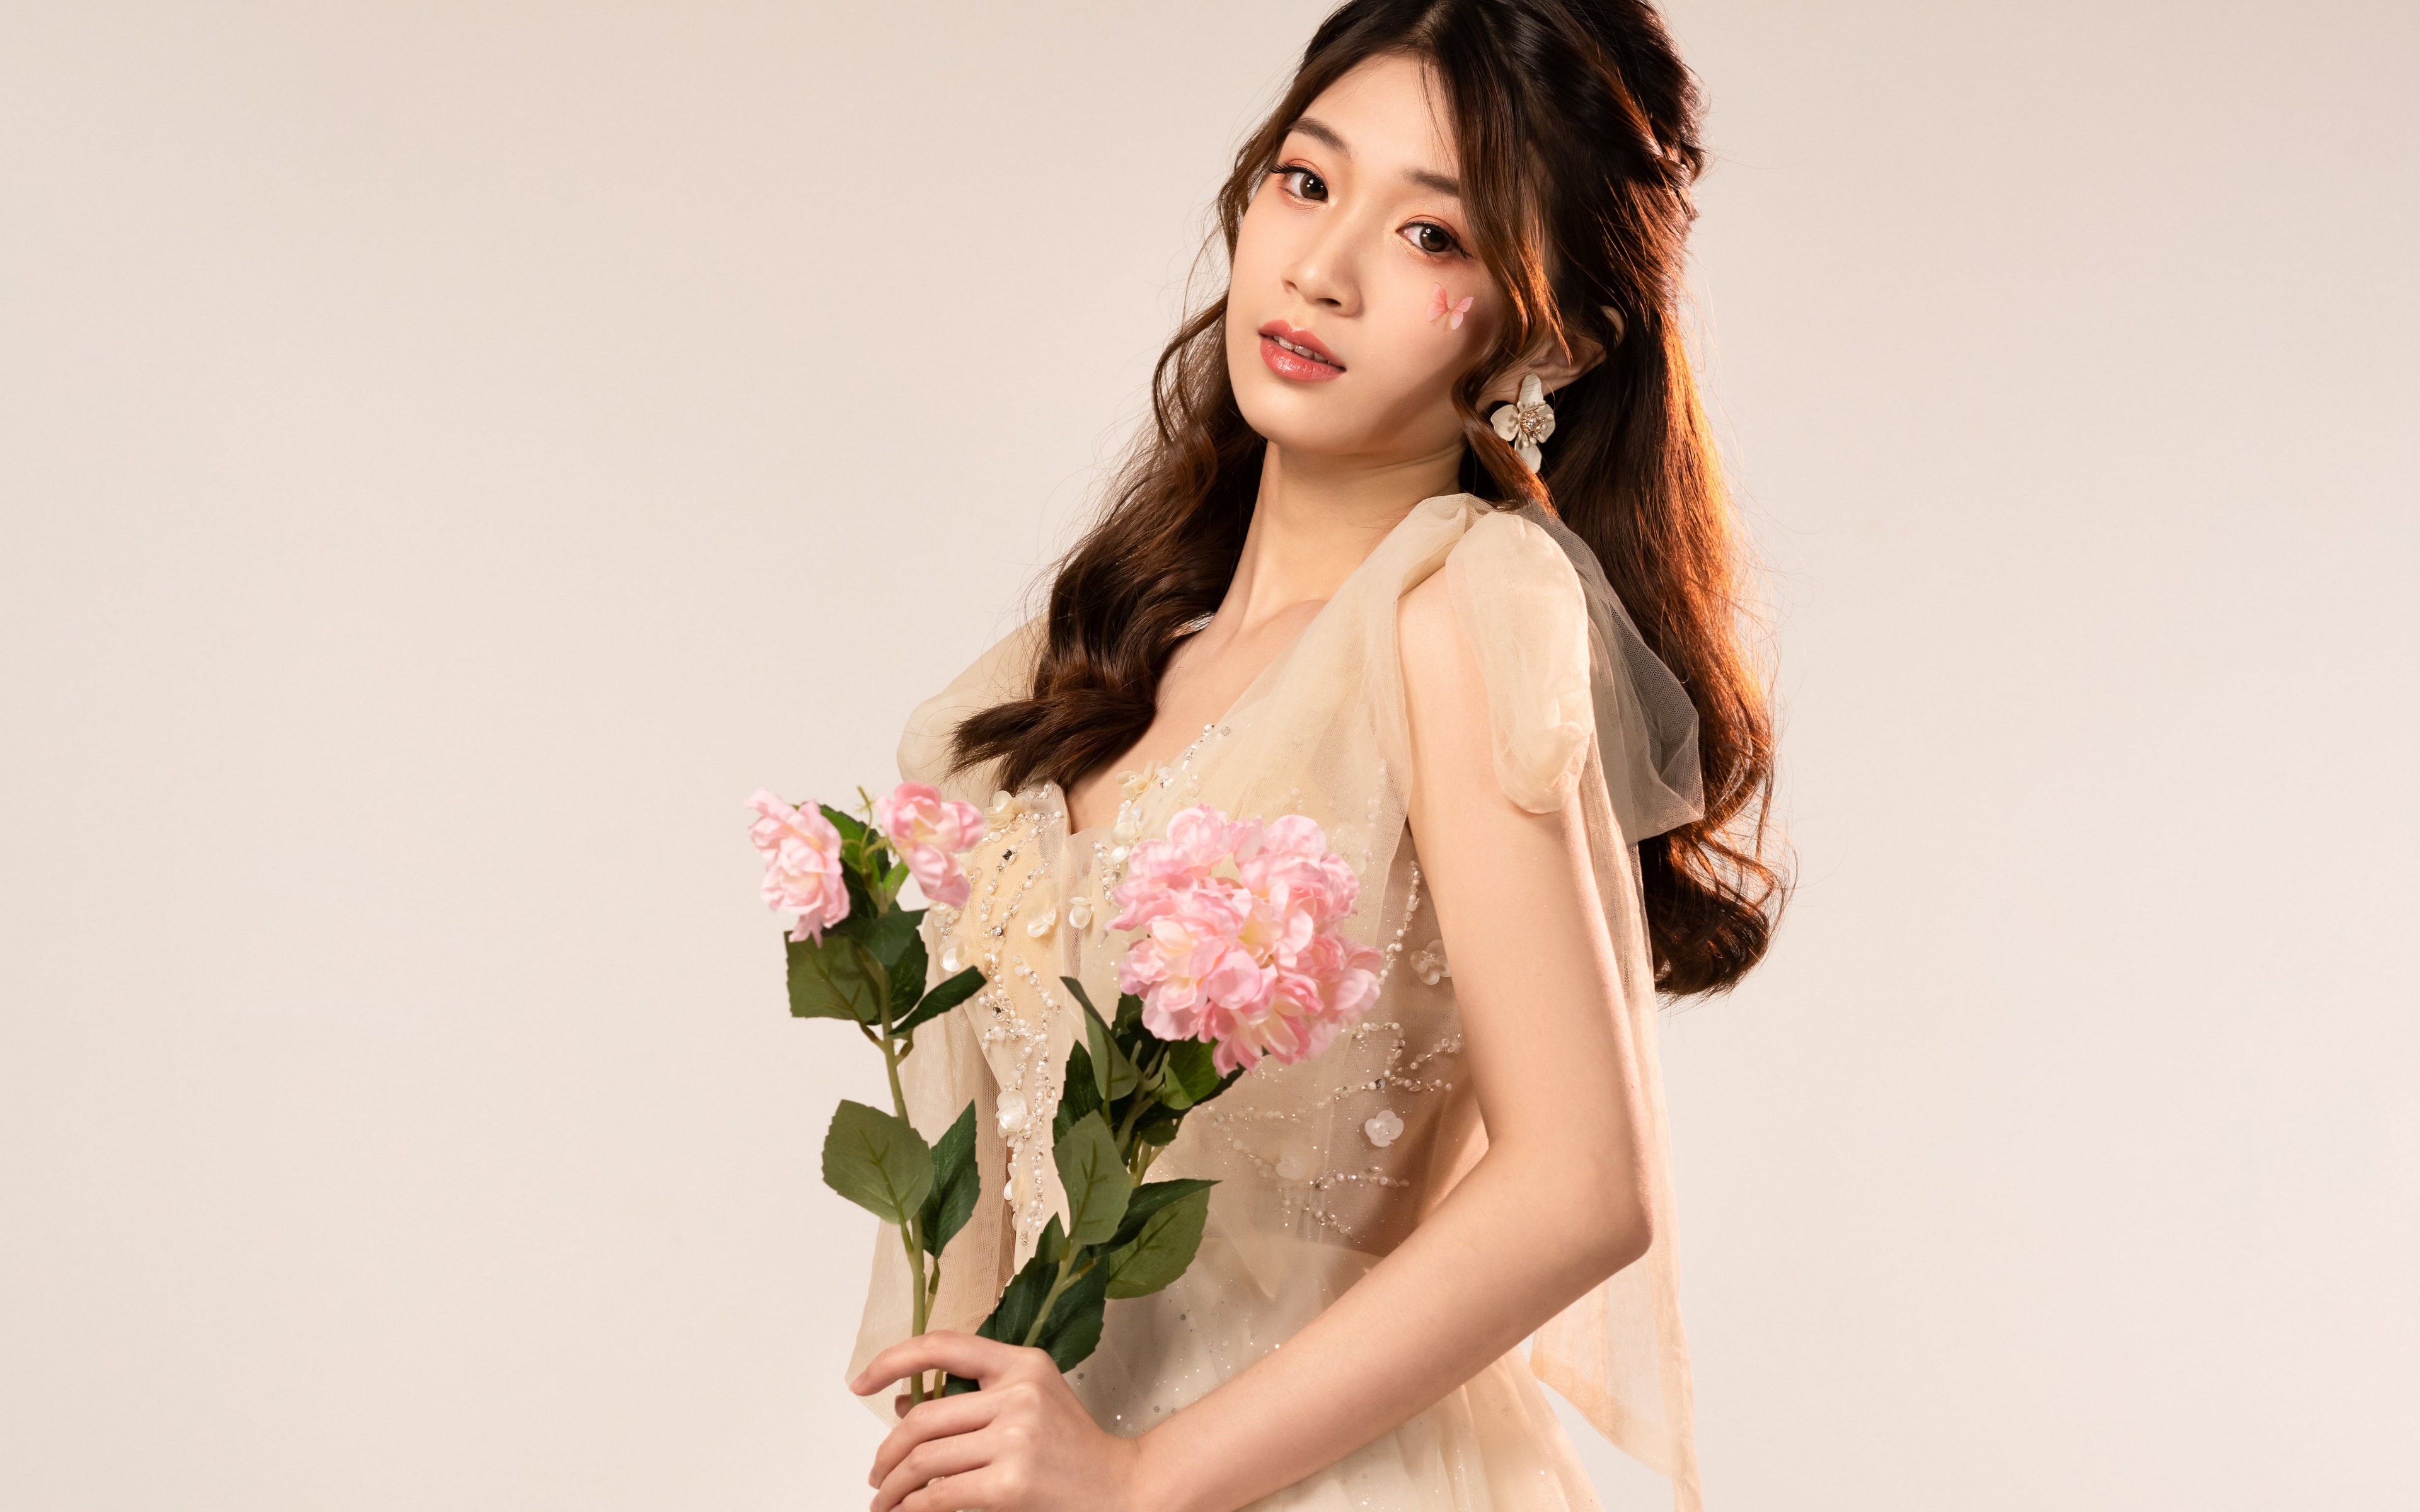 Fotos Sträuße junge Frauen Asiatische Blick 3840x2400 Blumensträuße Mädchens junge frau Asiaten asiatisches Starren